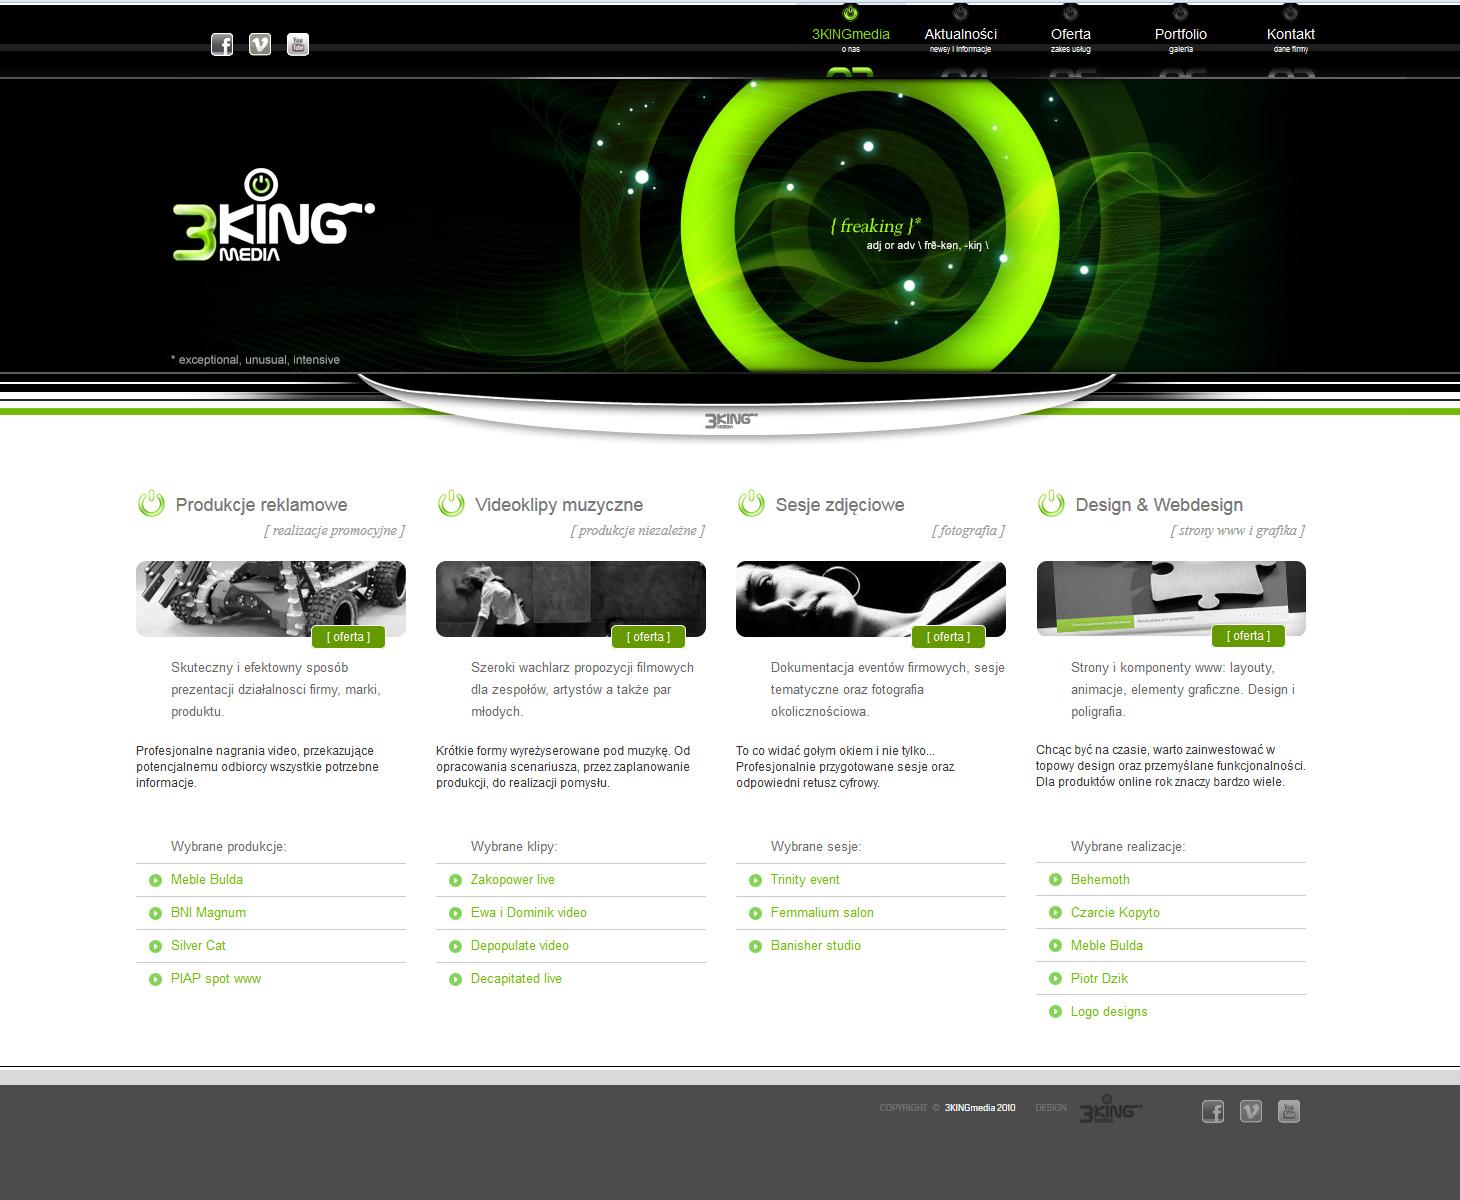 3kingmedia I-edycja